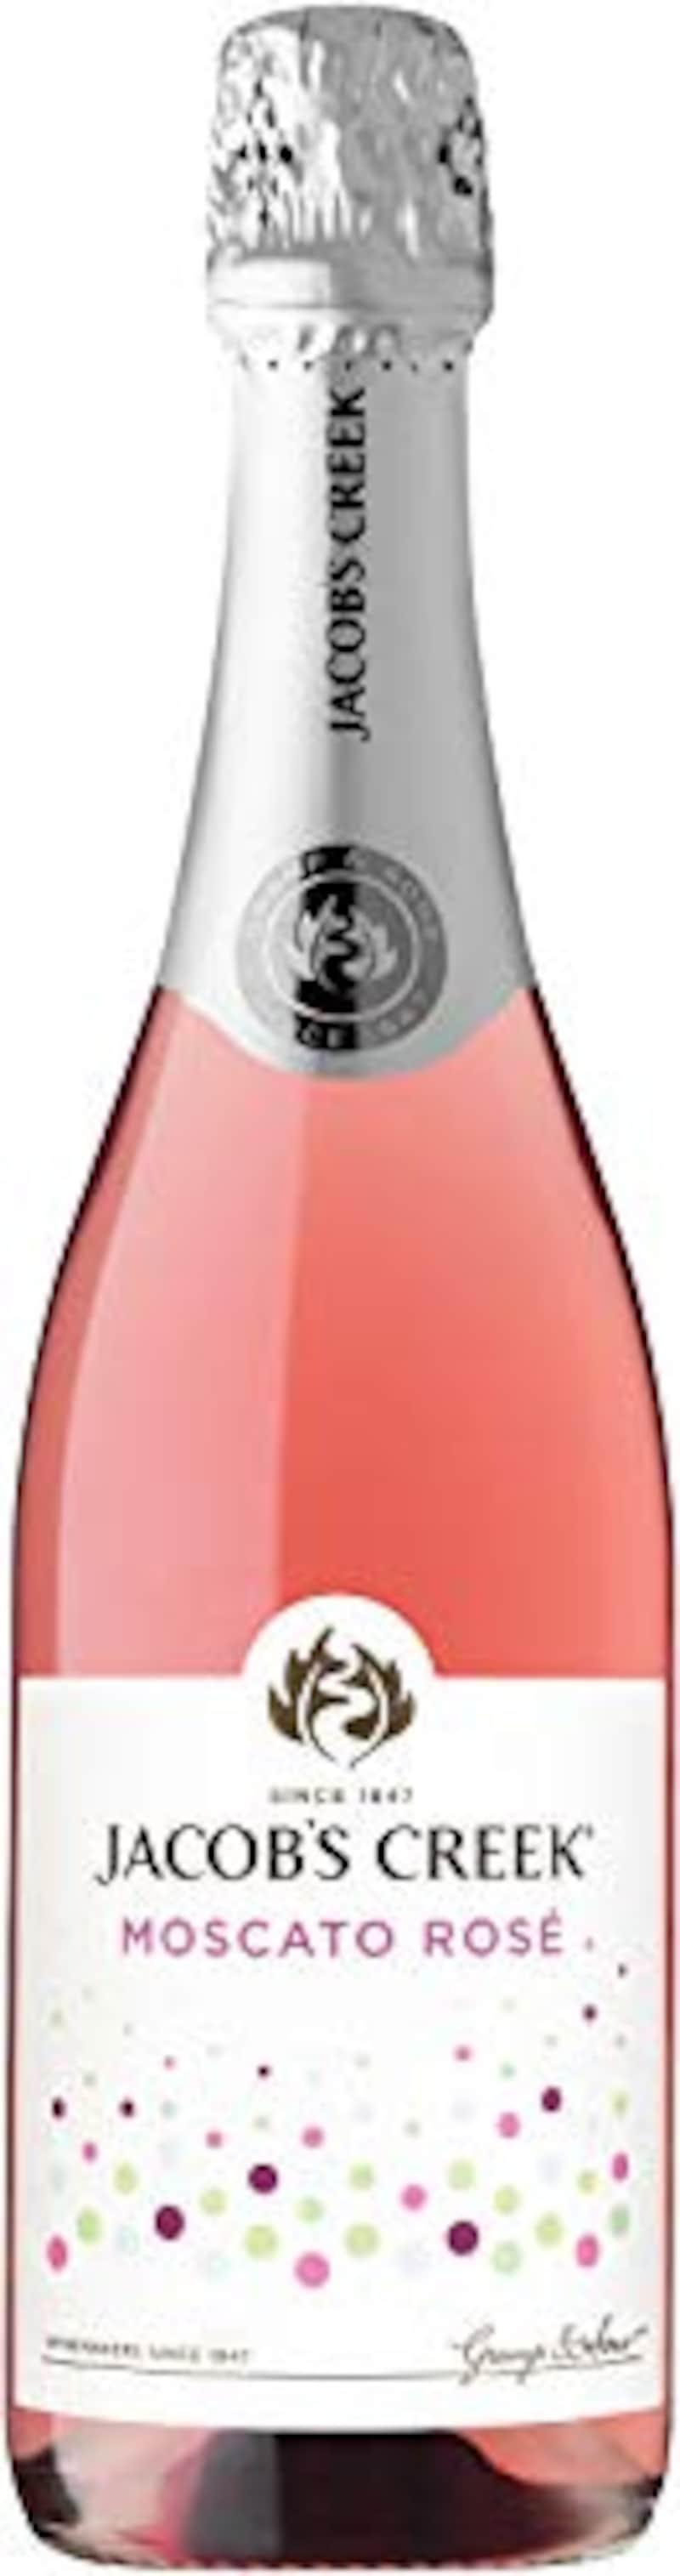 Pernod Ricard(ペルノリカール),ジェイコブス・クリーク マスカット・ロゼ スパークリング